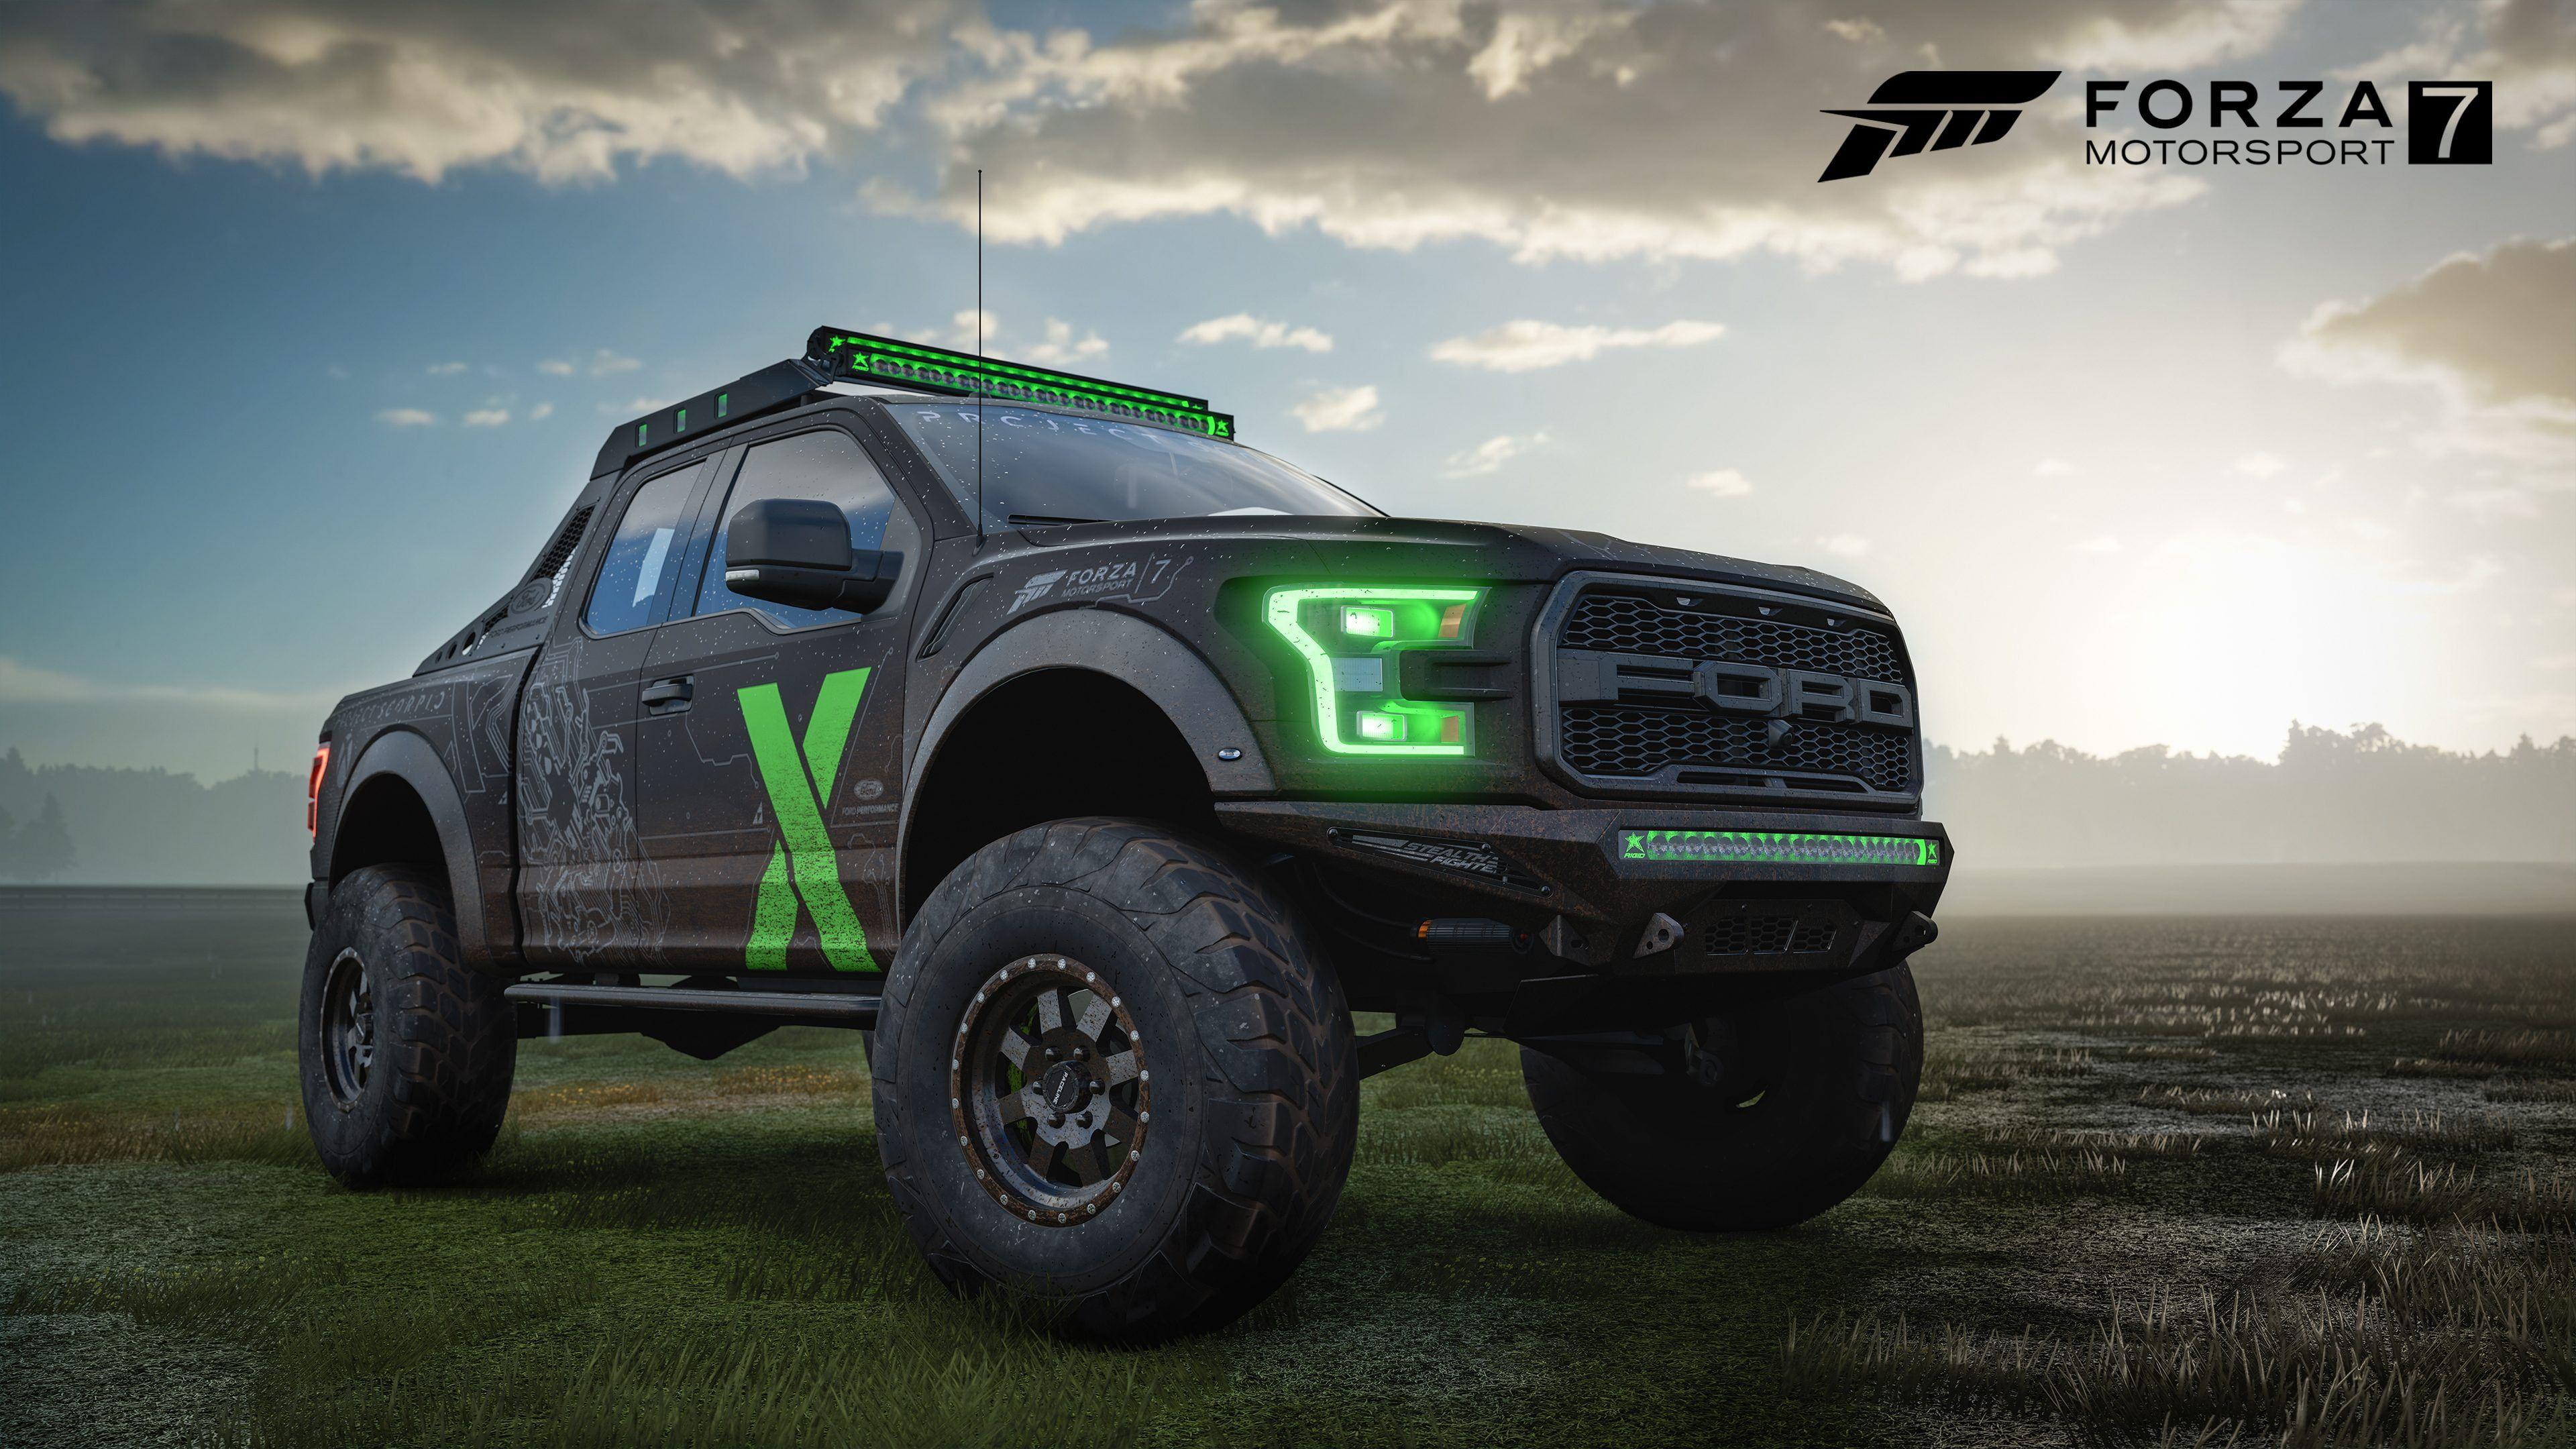 Forza Ford Raptor F150 Raptor Xbox Ford Car Truck Forza Motorsport 7 Video Game Art 4k Wallpaper Hdwallpaper D Forza Motorsport Motorsport Ford Raptor